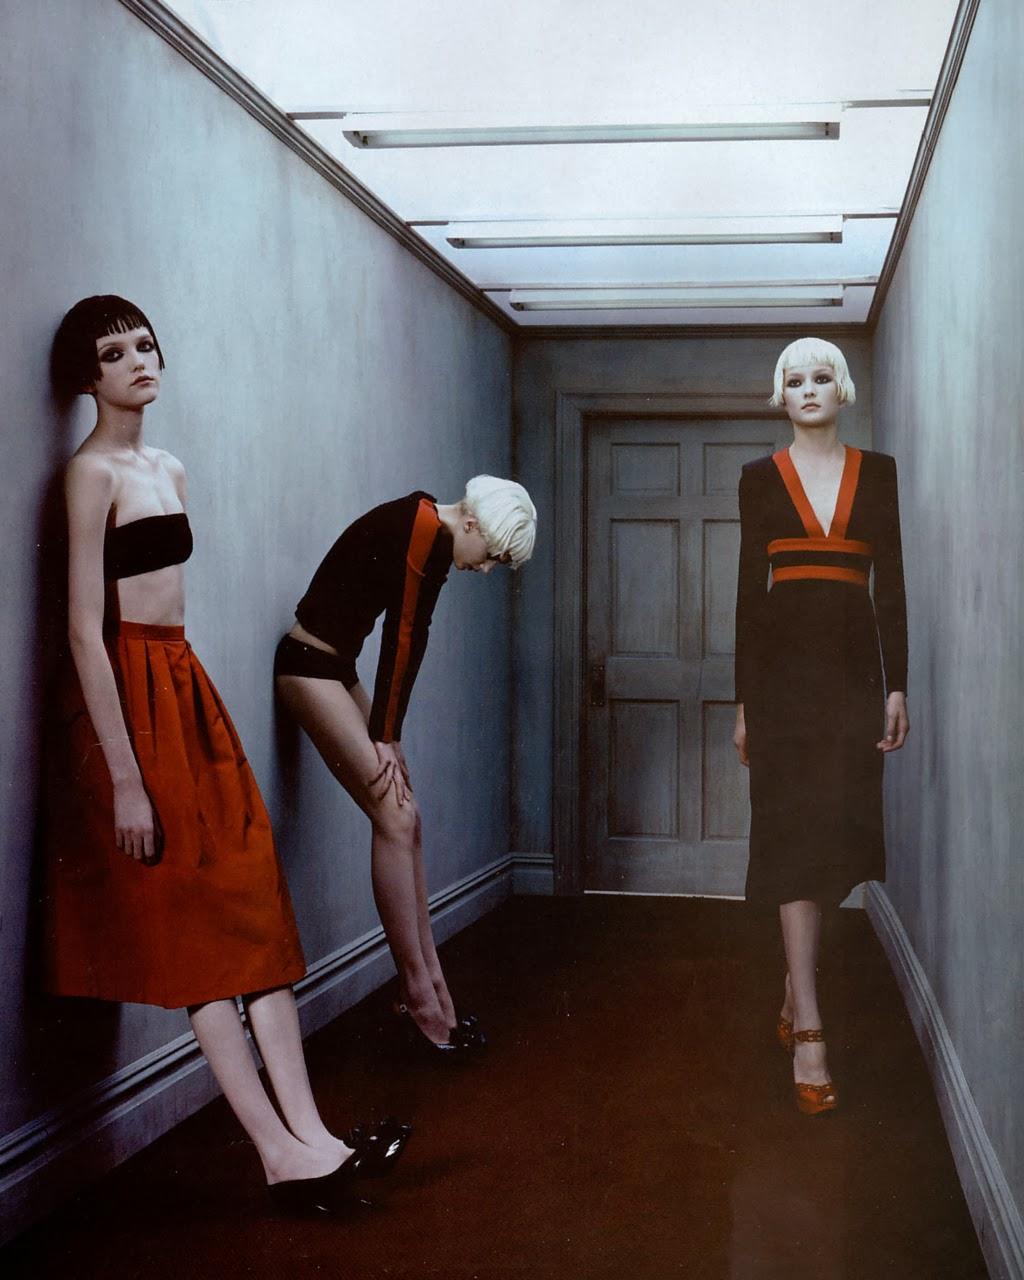 http://3.bp.blogspot.com/-PWx8Lty0mjI/UquPEbfq78I/AAAAAAAAMa0/QCc-X15gu3s/s1600/Solange+Wilvert+and+Vlada+Roslyakova+by+Steven+Klein+for+Vogue+Paris_1280.jpg